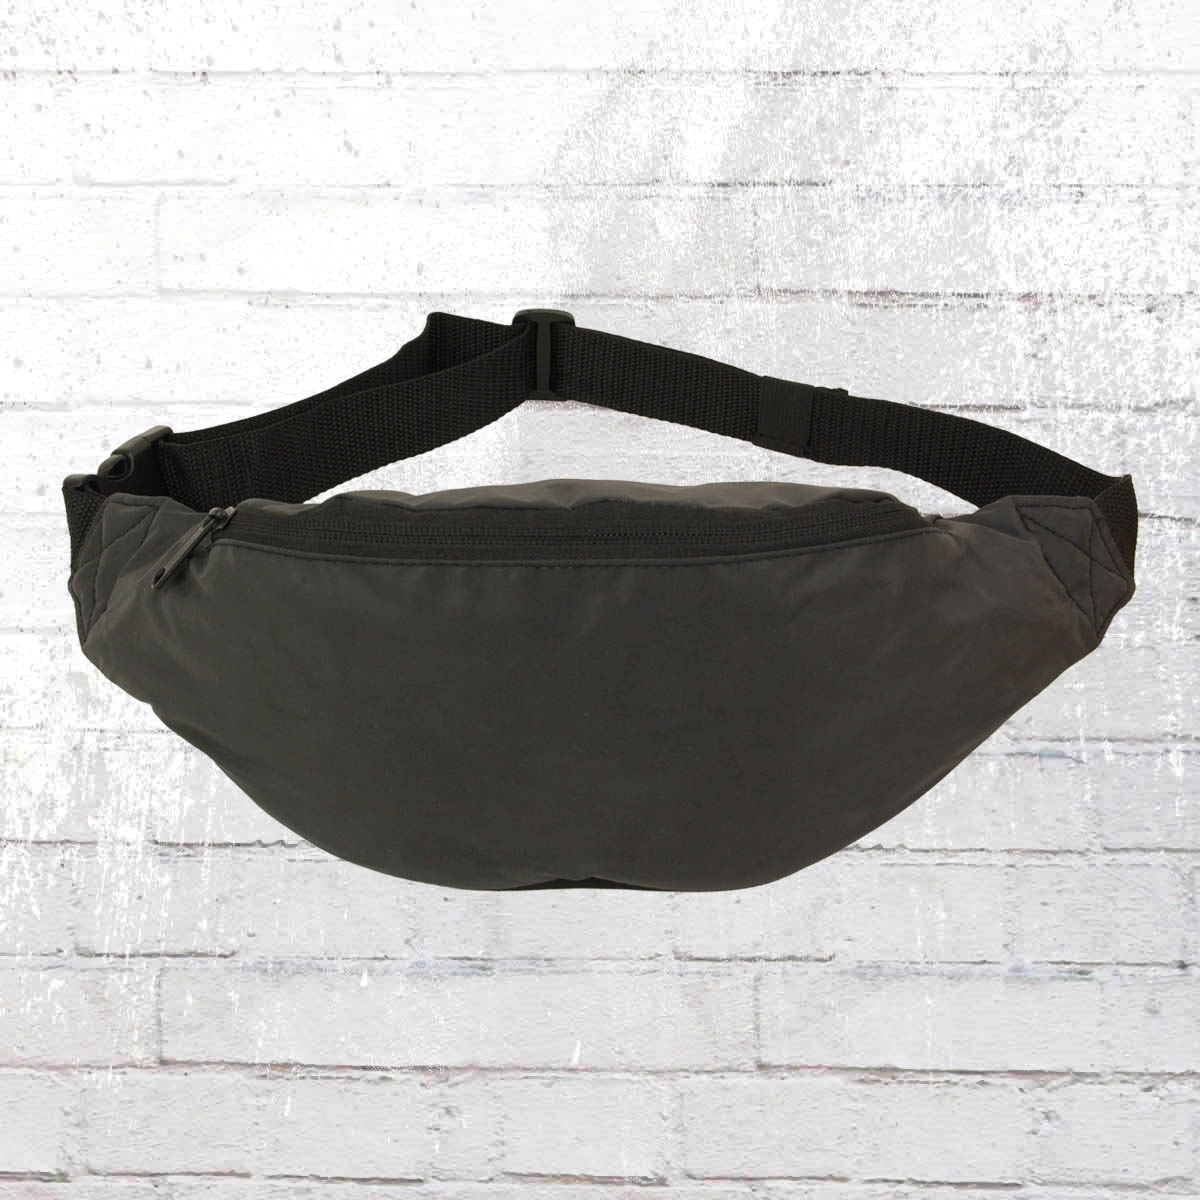 Bag Base Gürteltasche Reflective Belt Bag schwarz